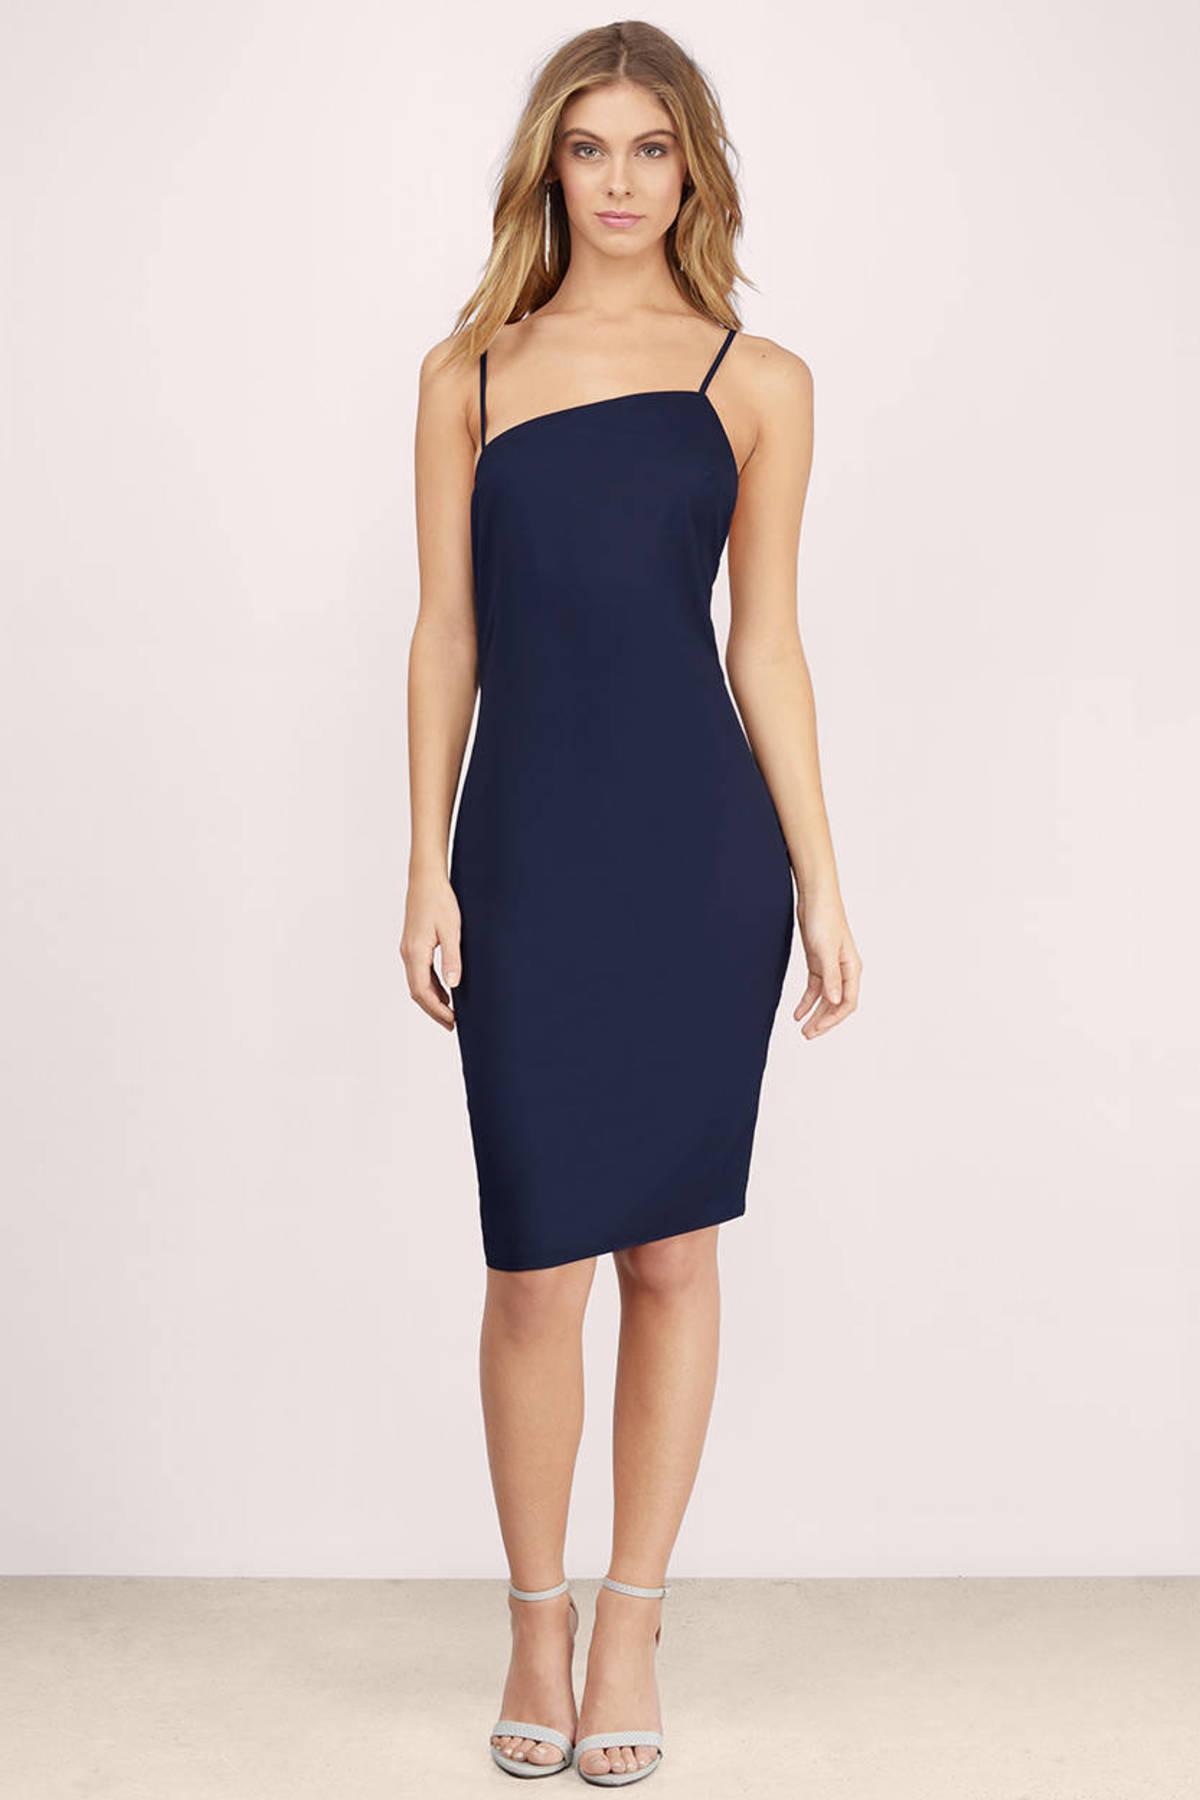 Navy blue dresses shop - Dress on sale